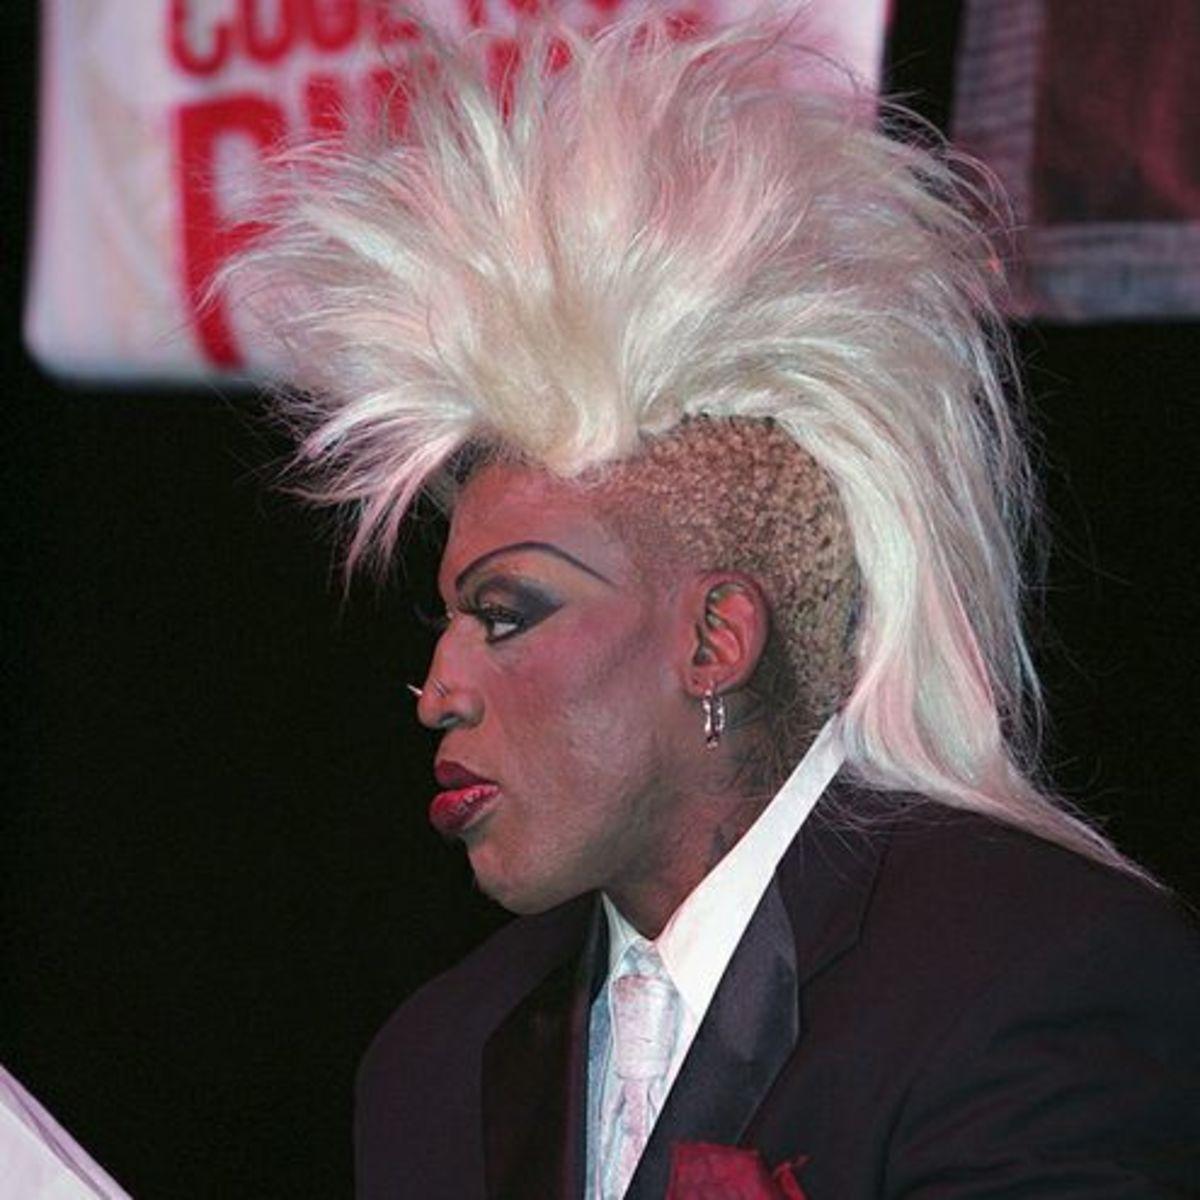 Dennis-Rodman-hair-6